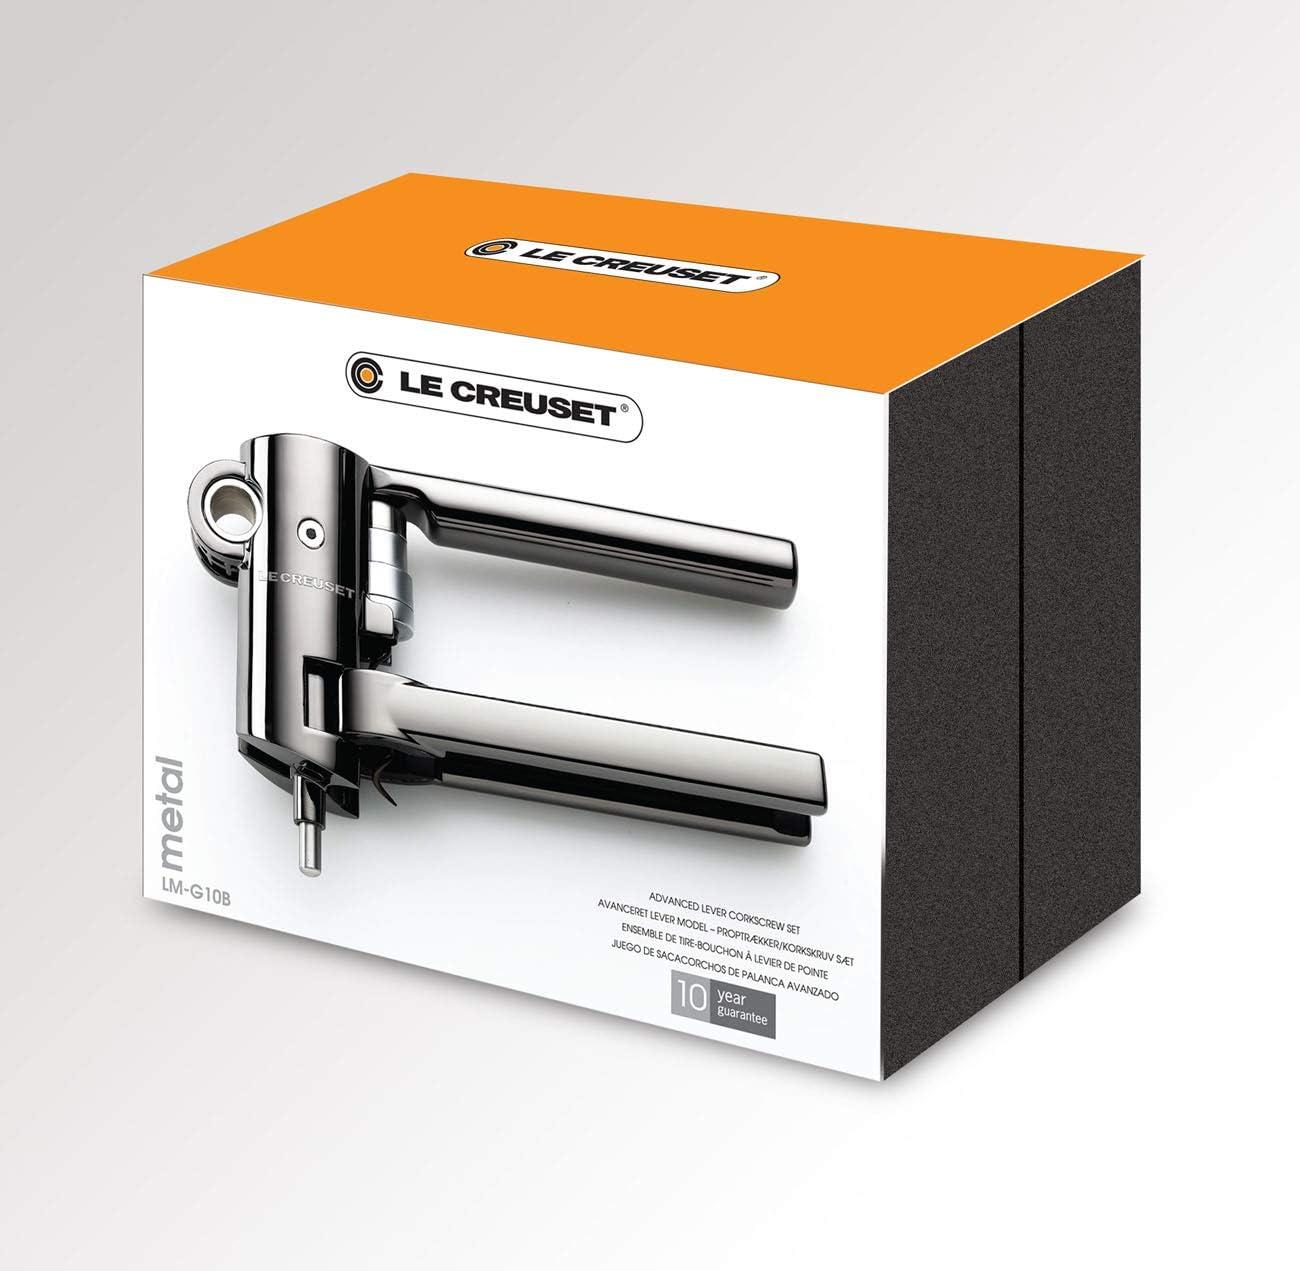 Le Creuset Screwpull Korkenzieher Leverpull LM-G10S